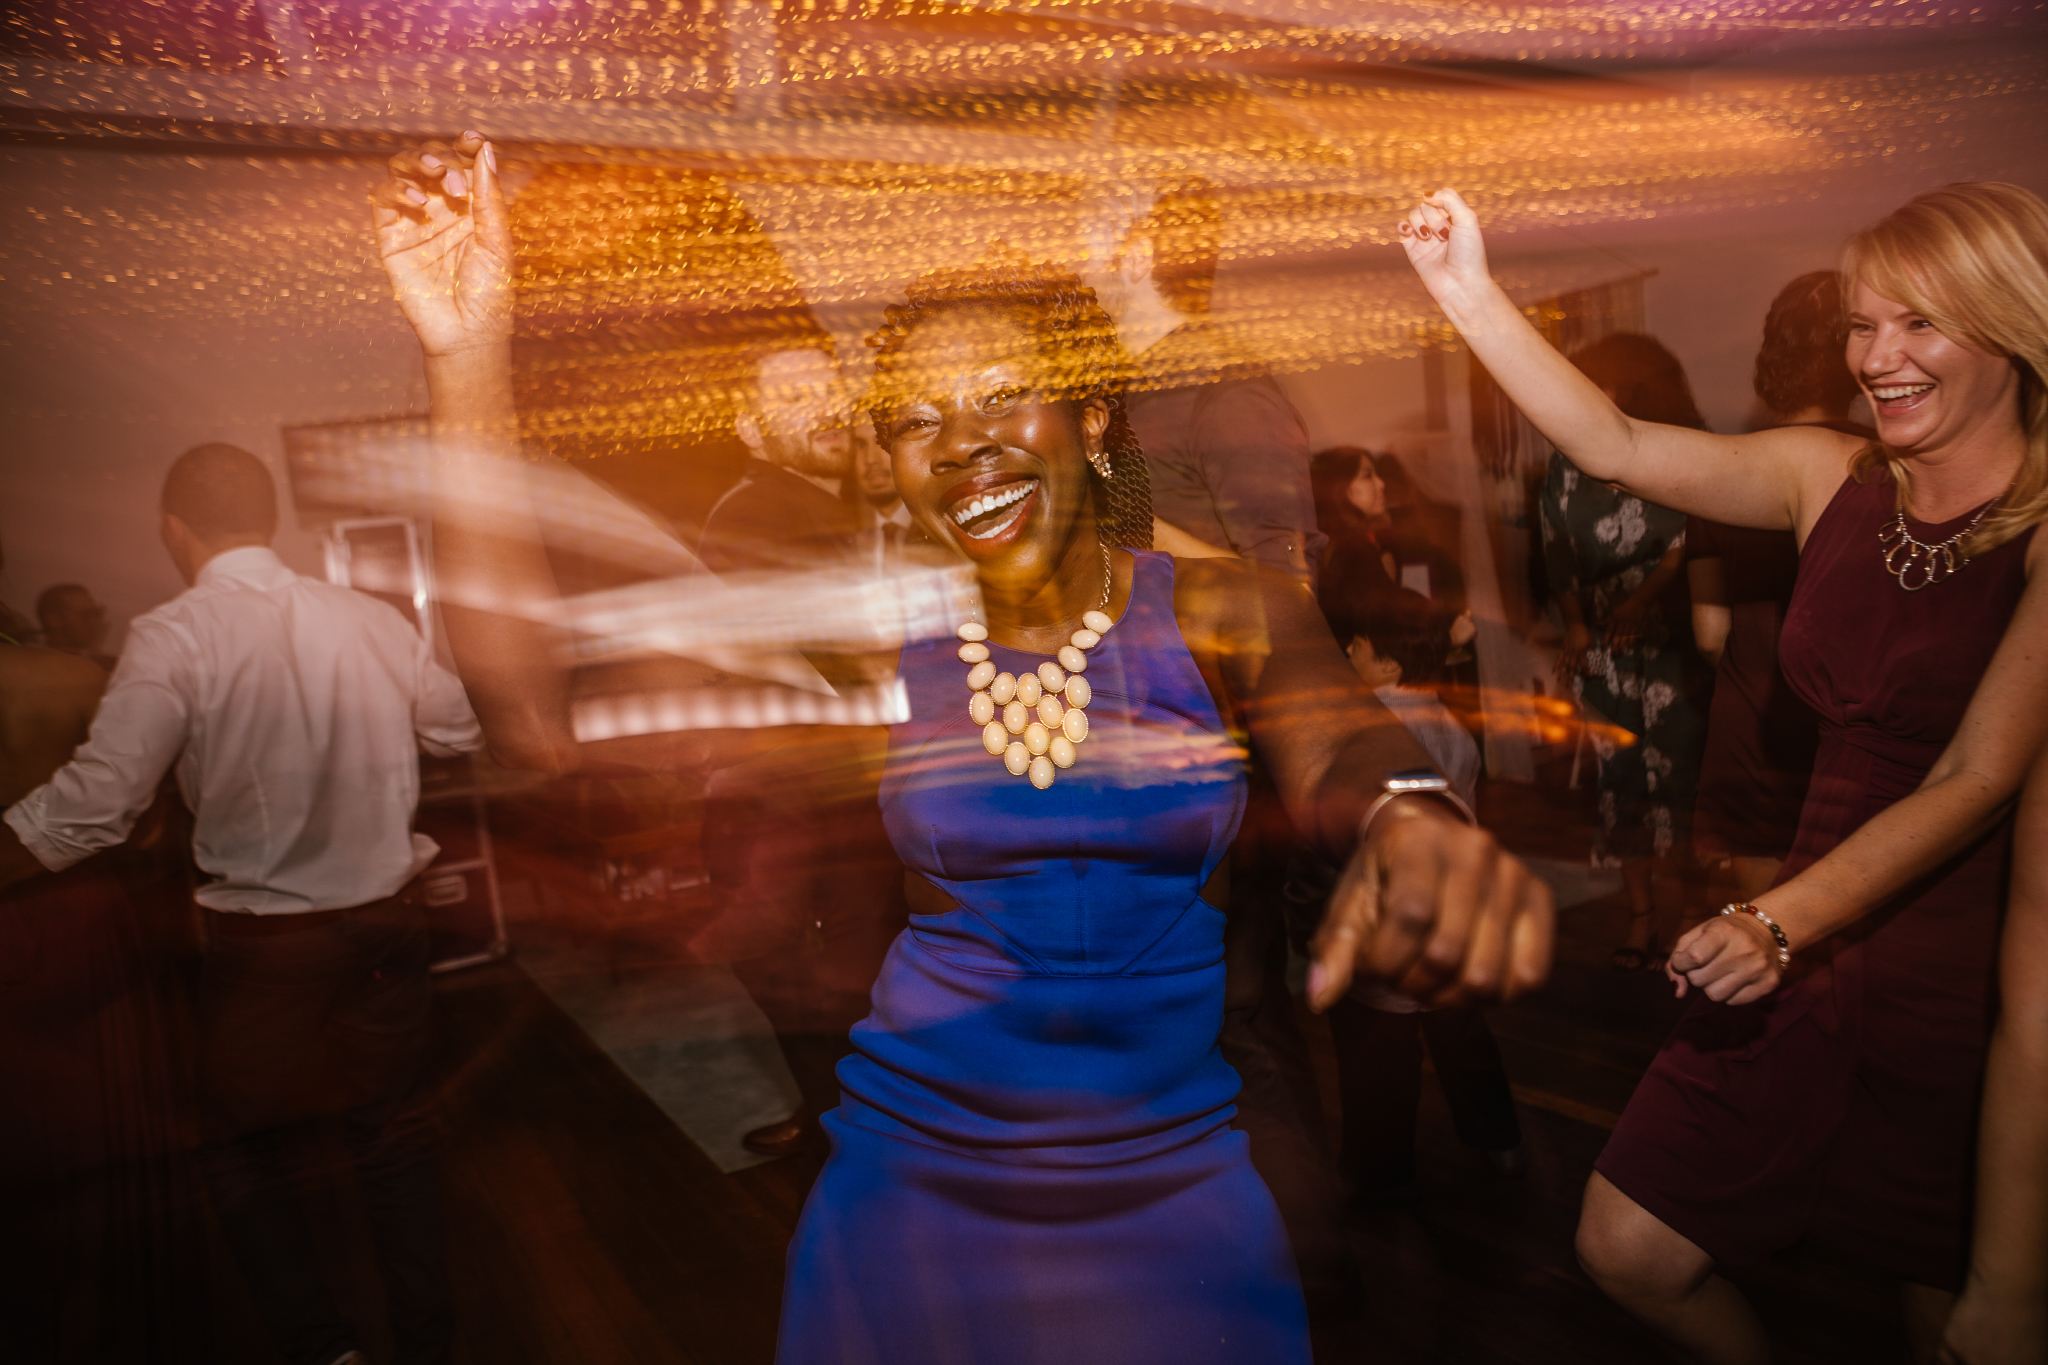 san diego wedding   photographer   long exposure shot of woman in blue dancing